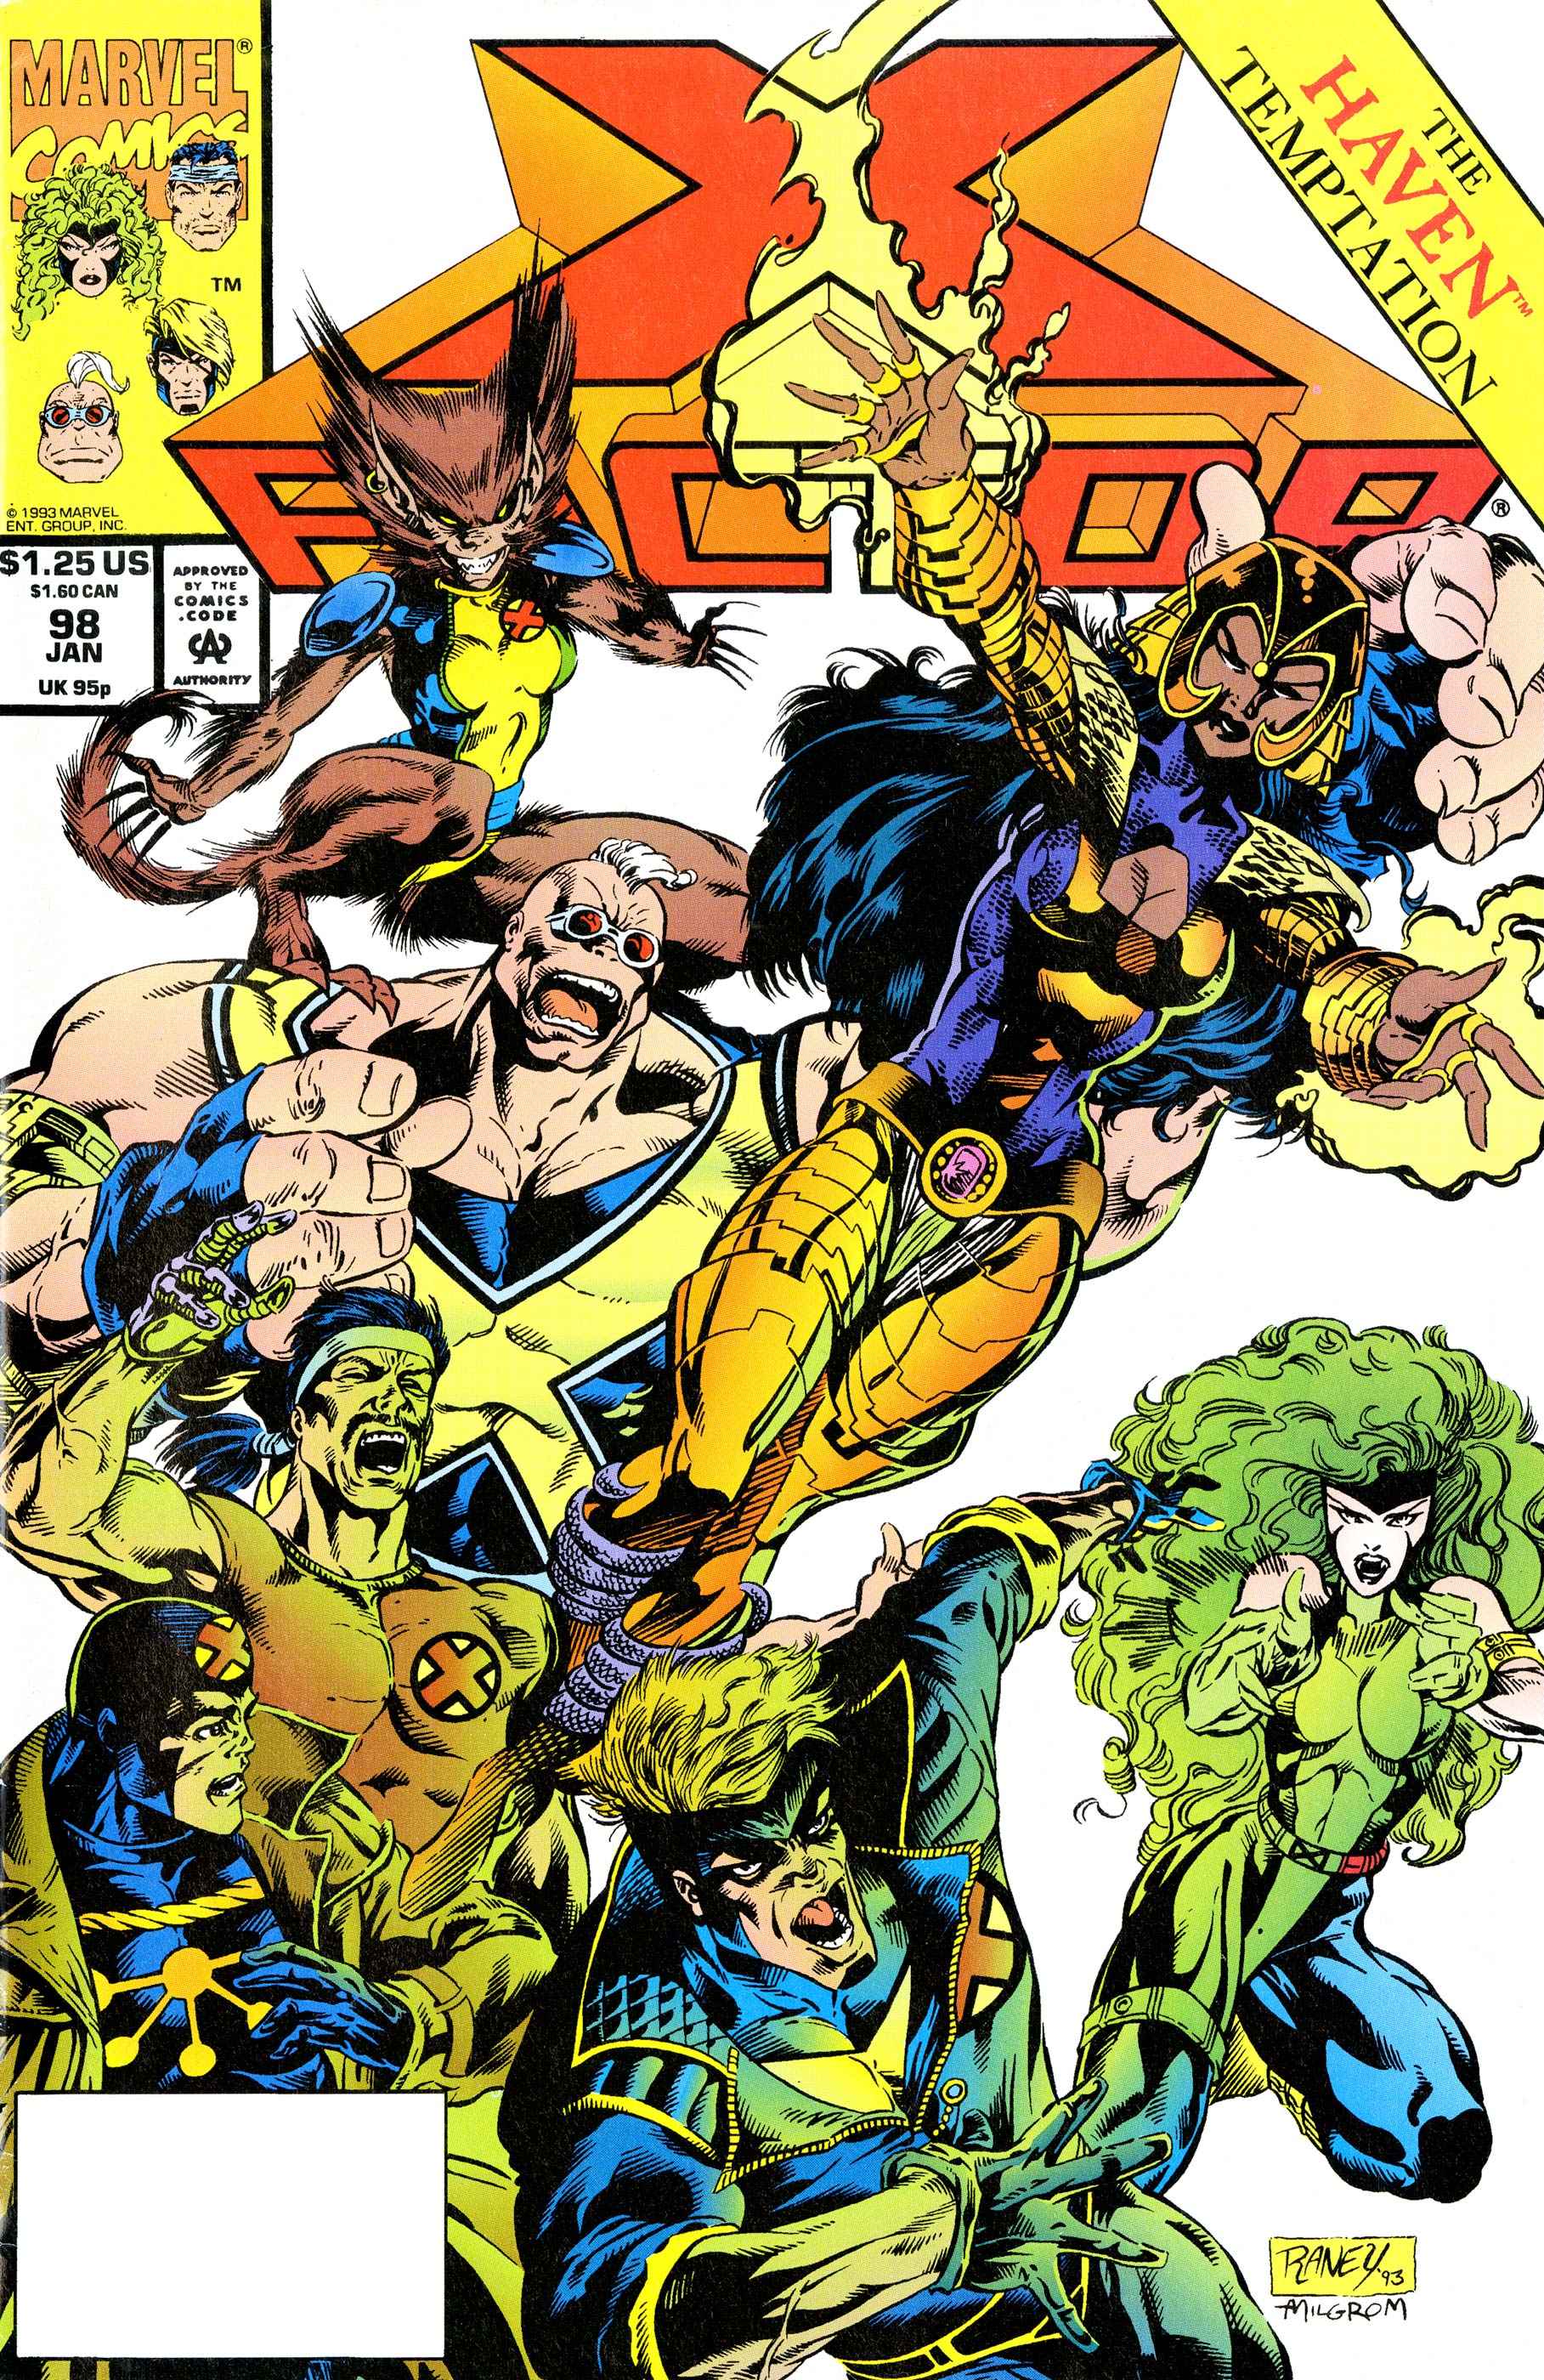 X-Factor (1986) #98